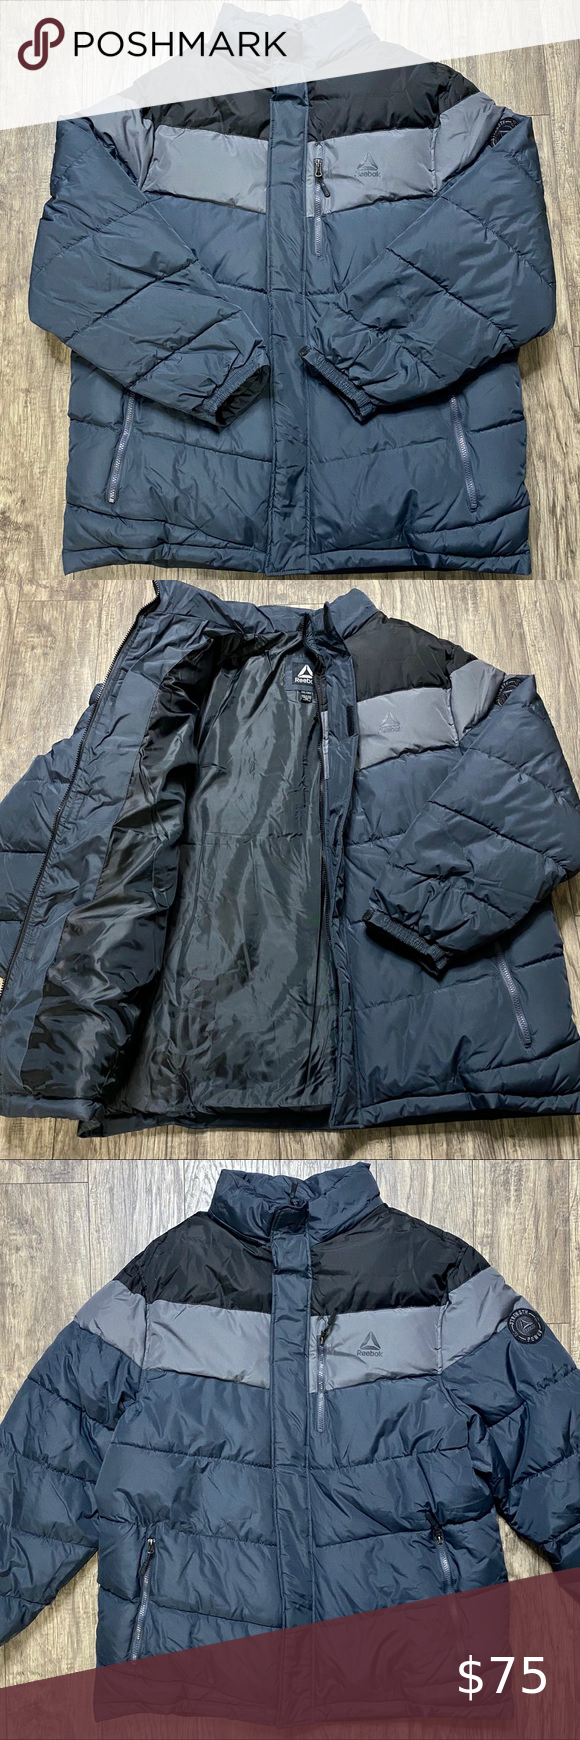 Reebok Slanted Puffer Jacket Color Block Nwot Xxl Fashion Clothes Design Puffer Jackets [ 1740 x 580 Pixel ]